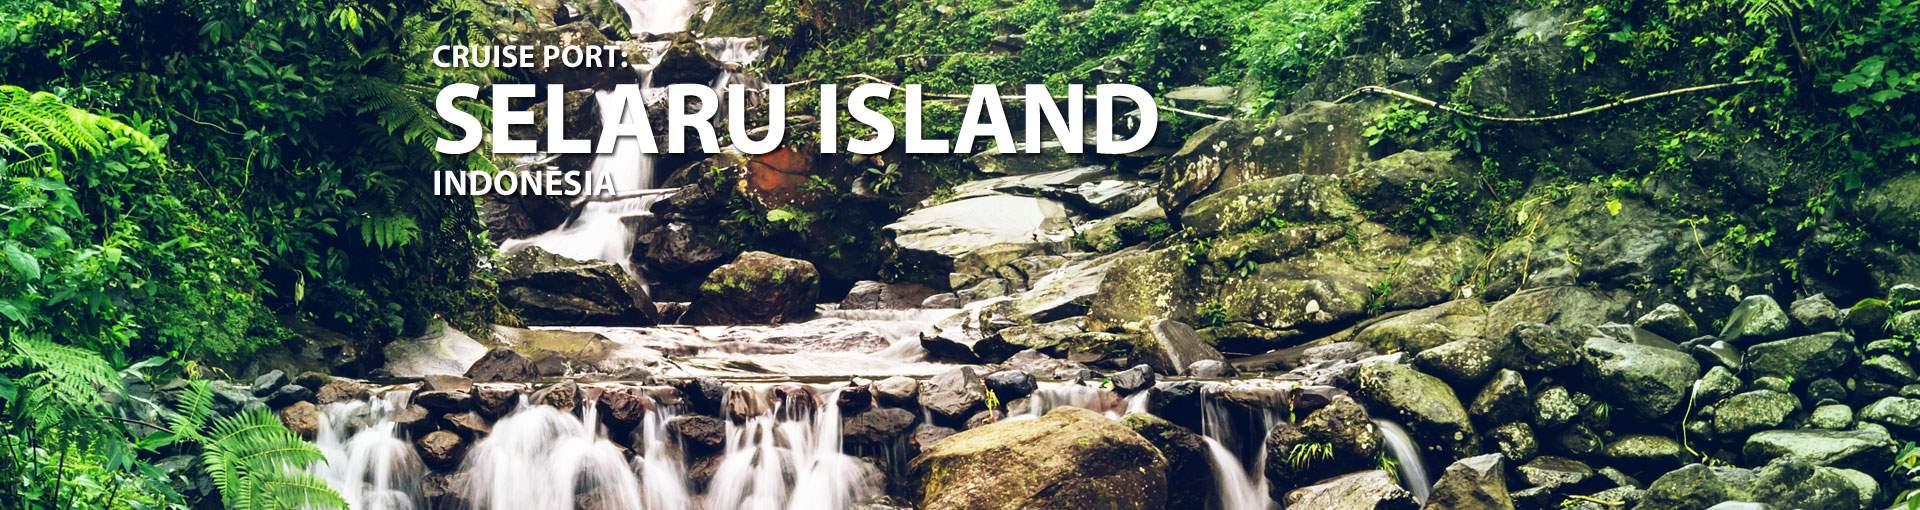 Cruises to Selaru Island, Indonesia